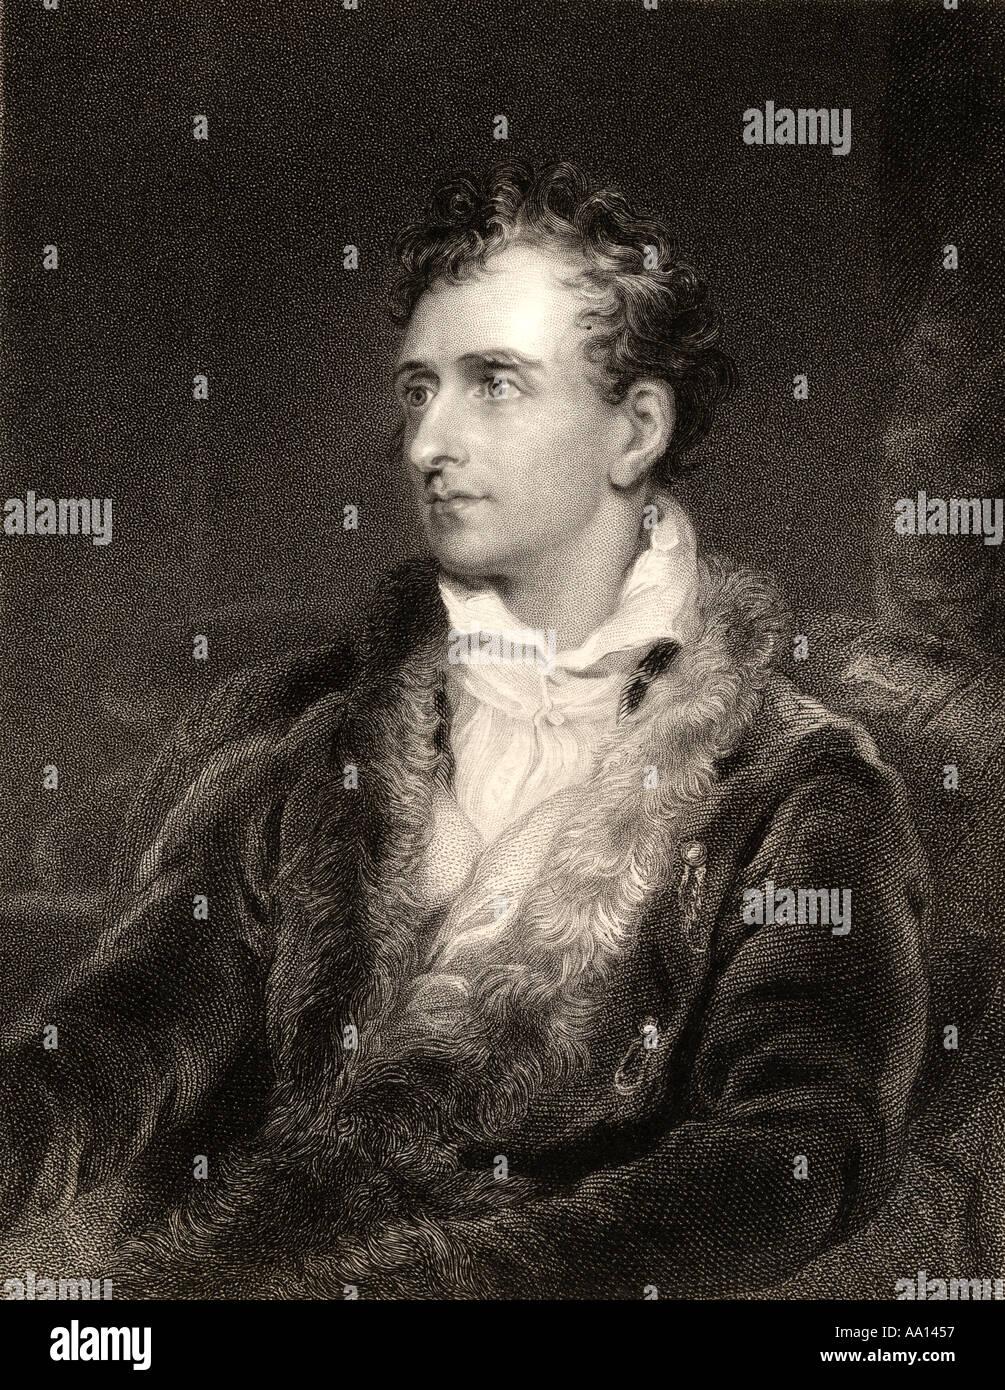 Antonio Canova, Marquess DIschia, 1757-1822.  Italian sculptor, great exponent of Neo - classicism - Stock Image